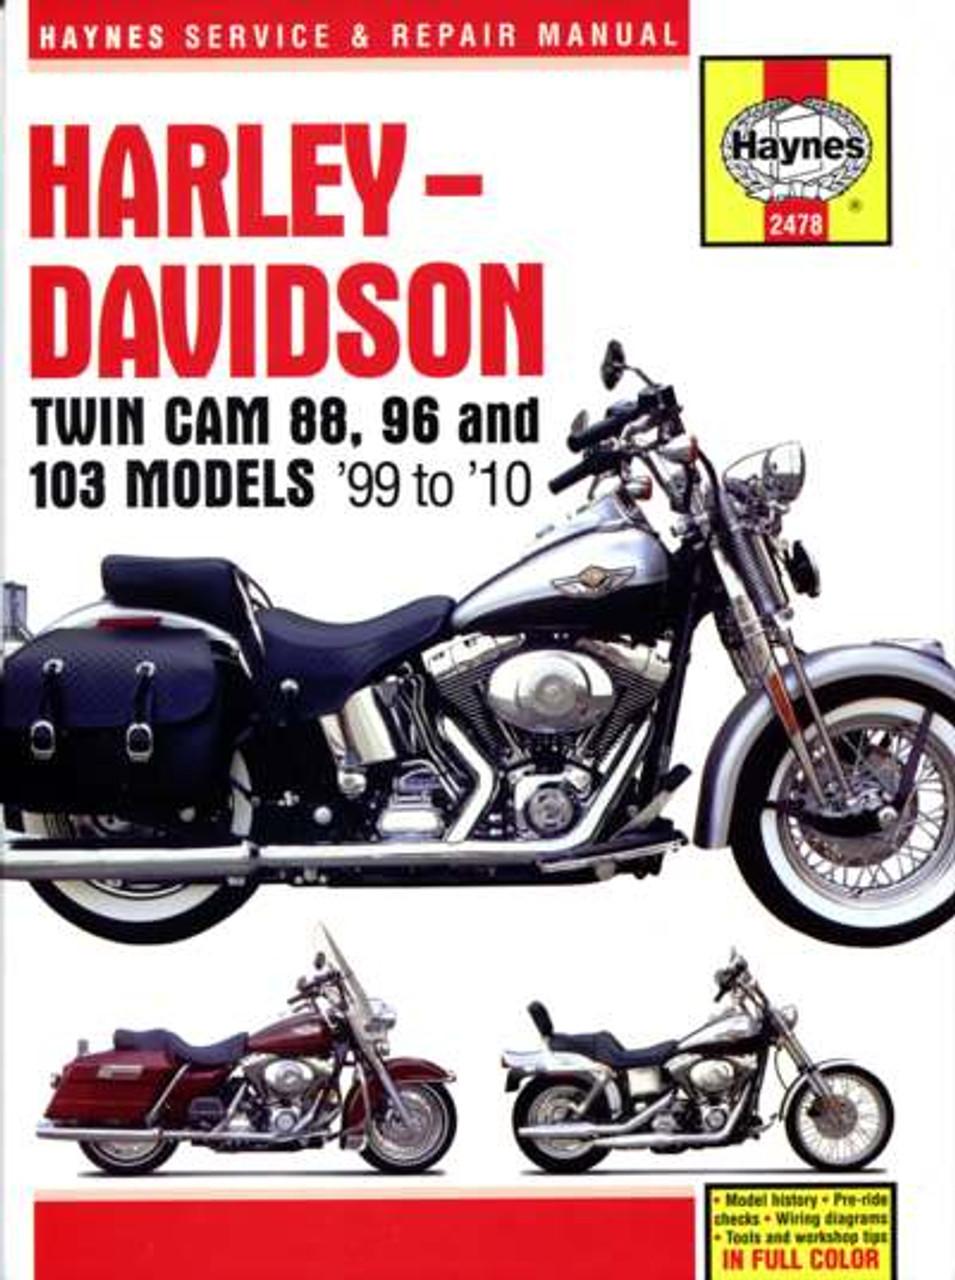 harley davidson 103 engine diagram [ 955 x 1280 Pixel ]